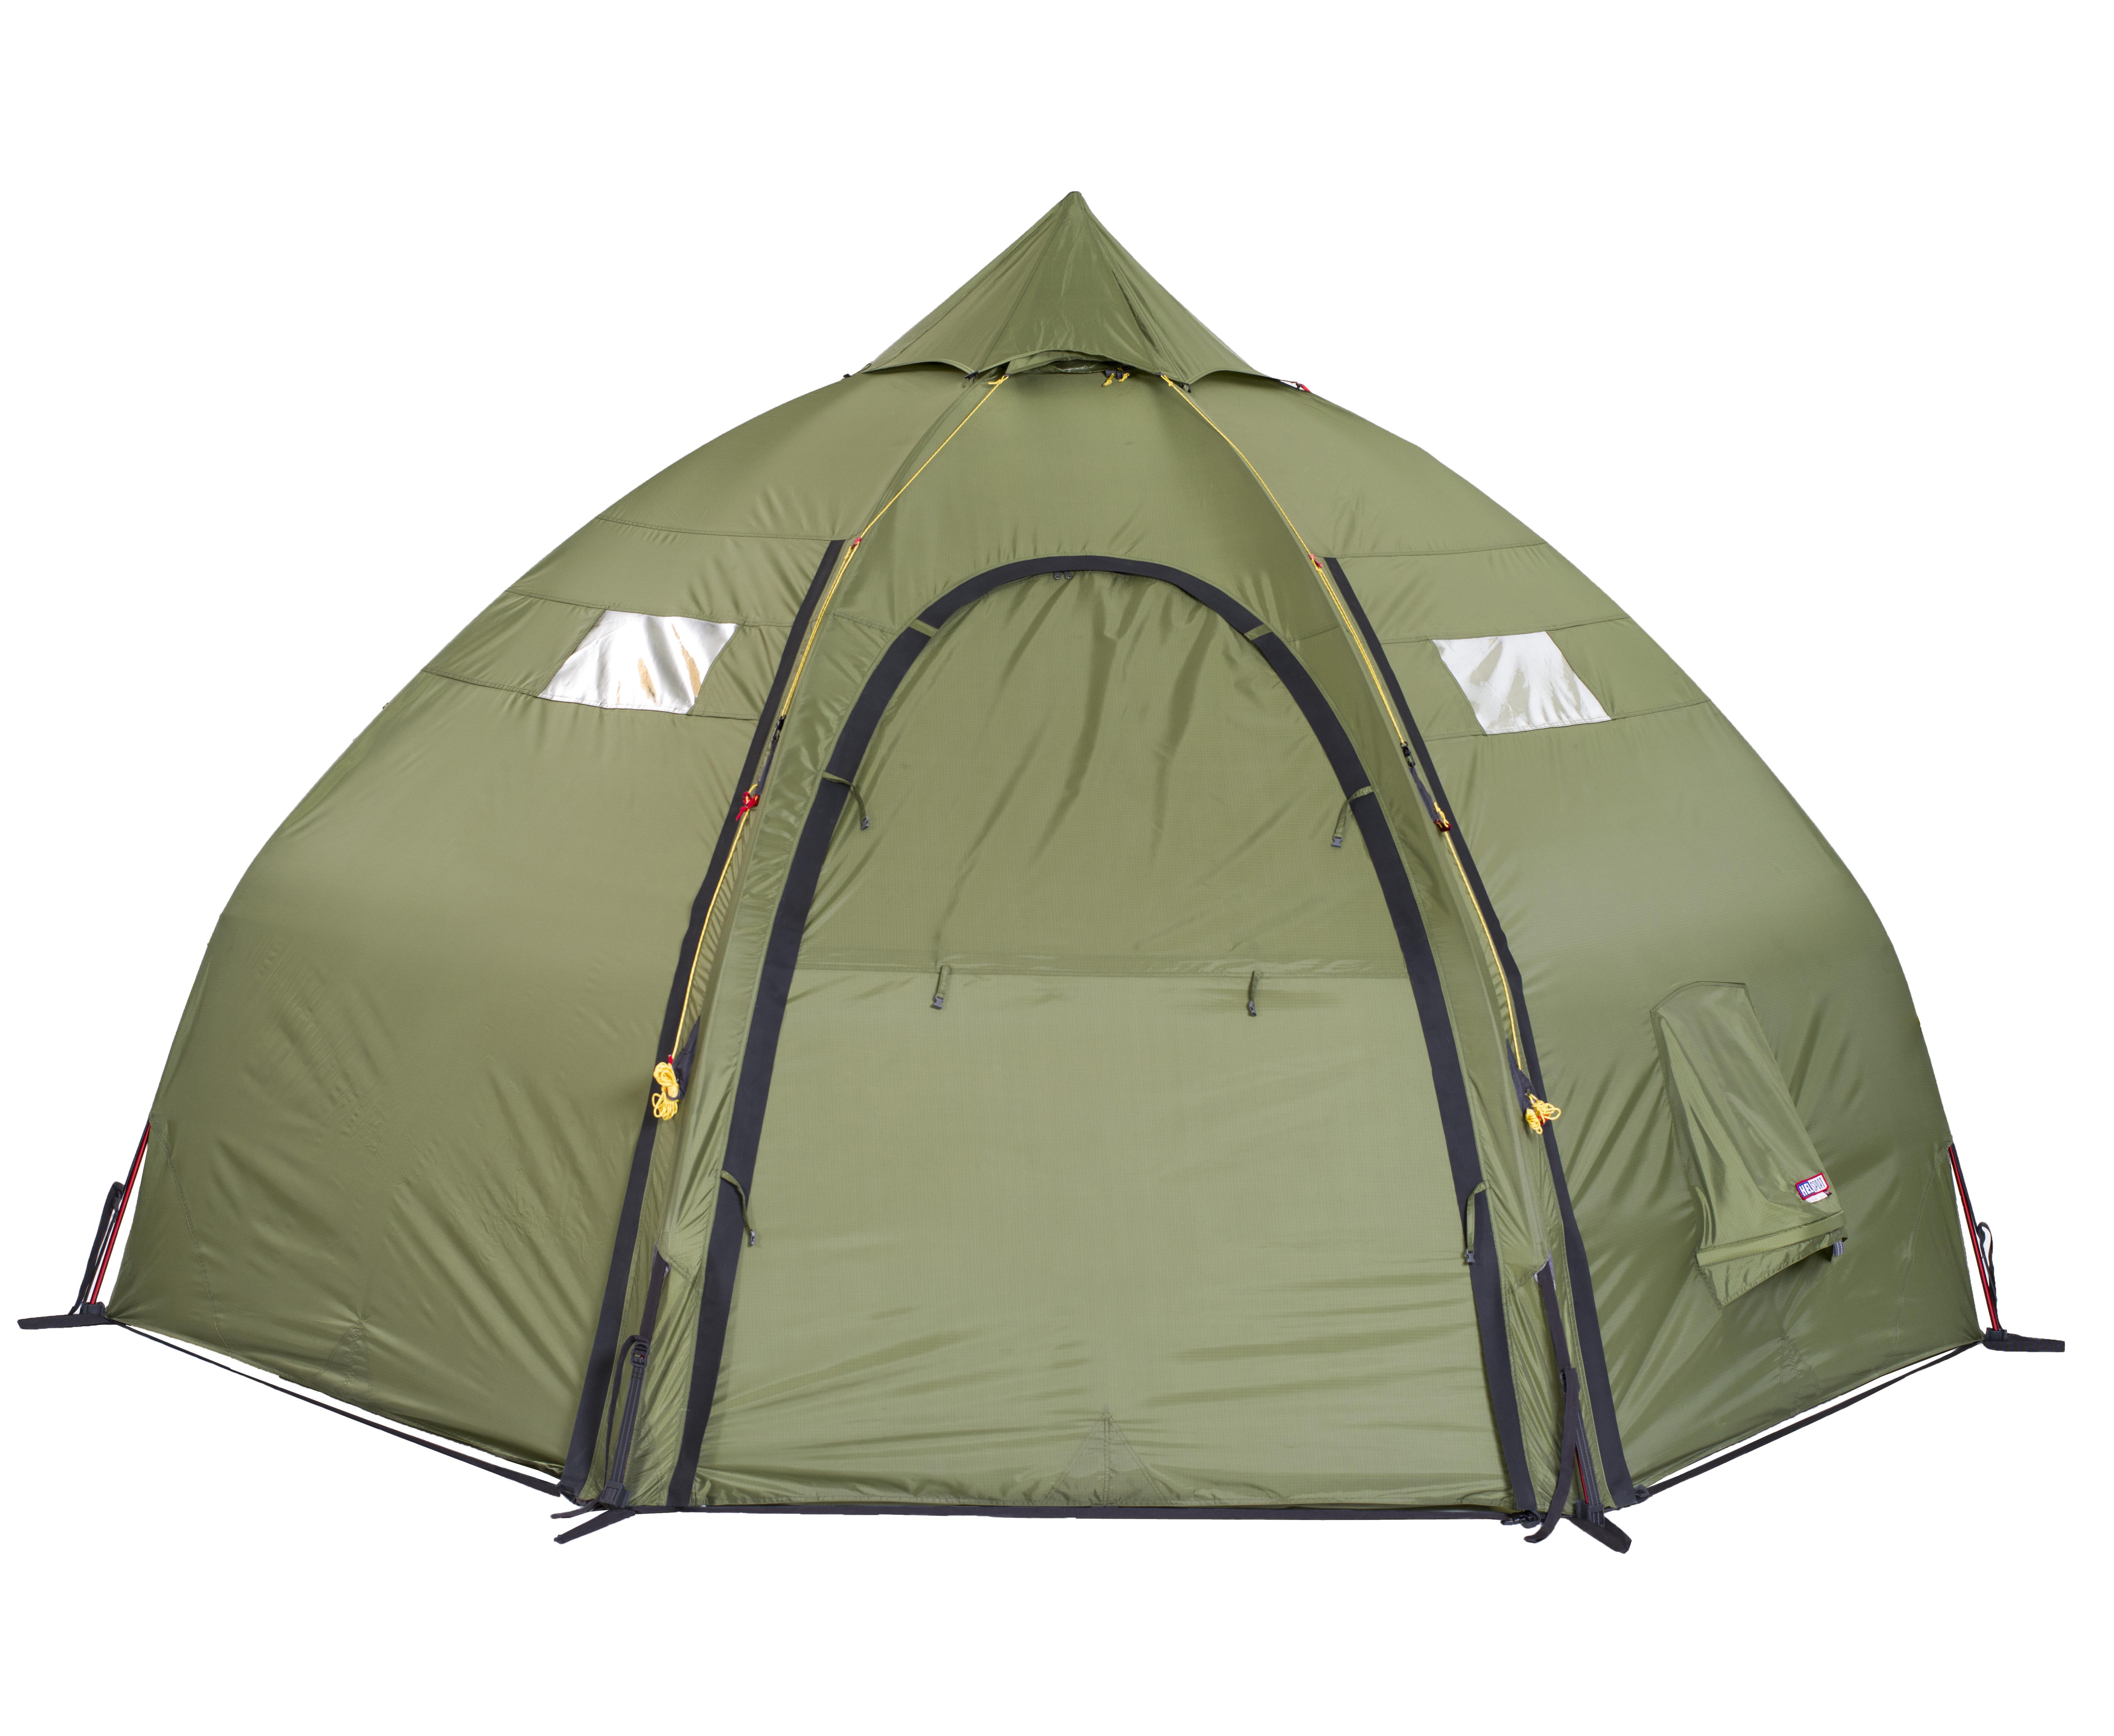 Varanger Dome Tents From Helsport Wild Coast Tents